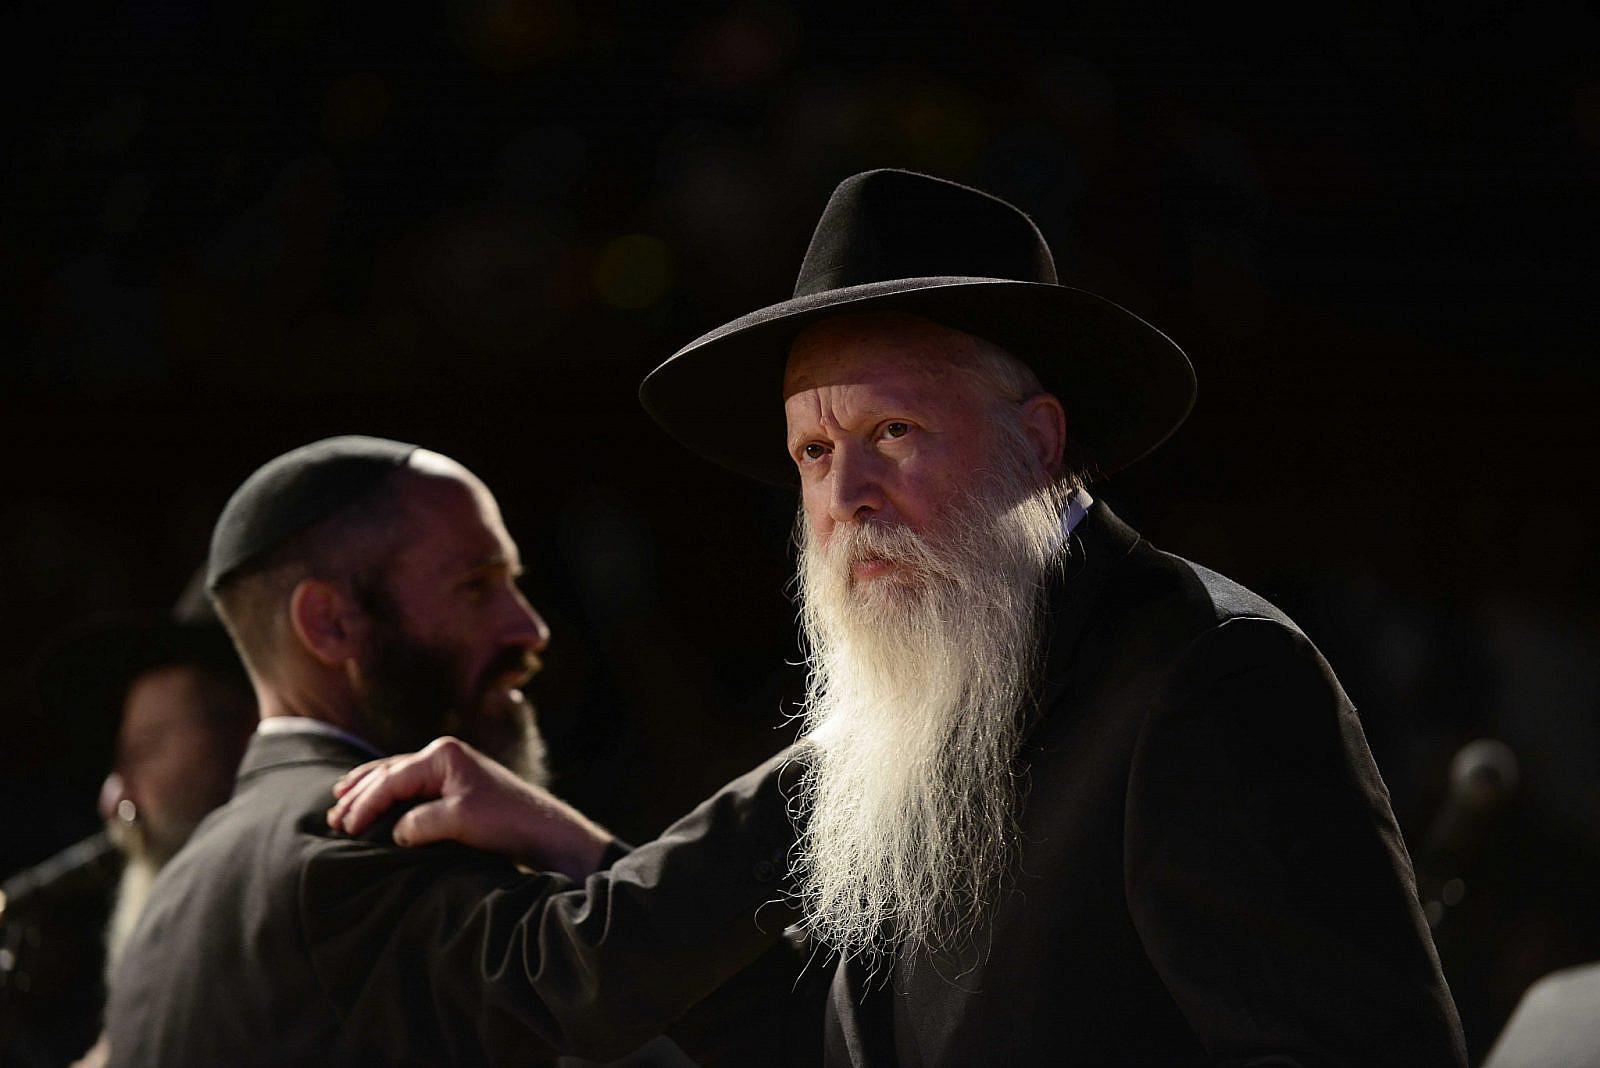 American-born Israeli rabbi Yitzchak Ginsburgh, president of the Od Yosef Chai Yeshiva in the settlement of Yitzhar, speaks at a Chabad conference in Tel Aviv, on December 02, 2015. (Tomer Neuberg / FLASH90)